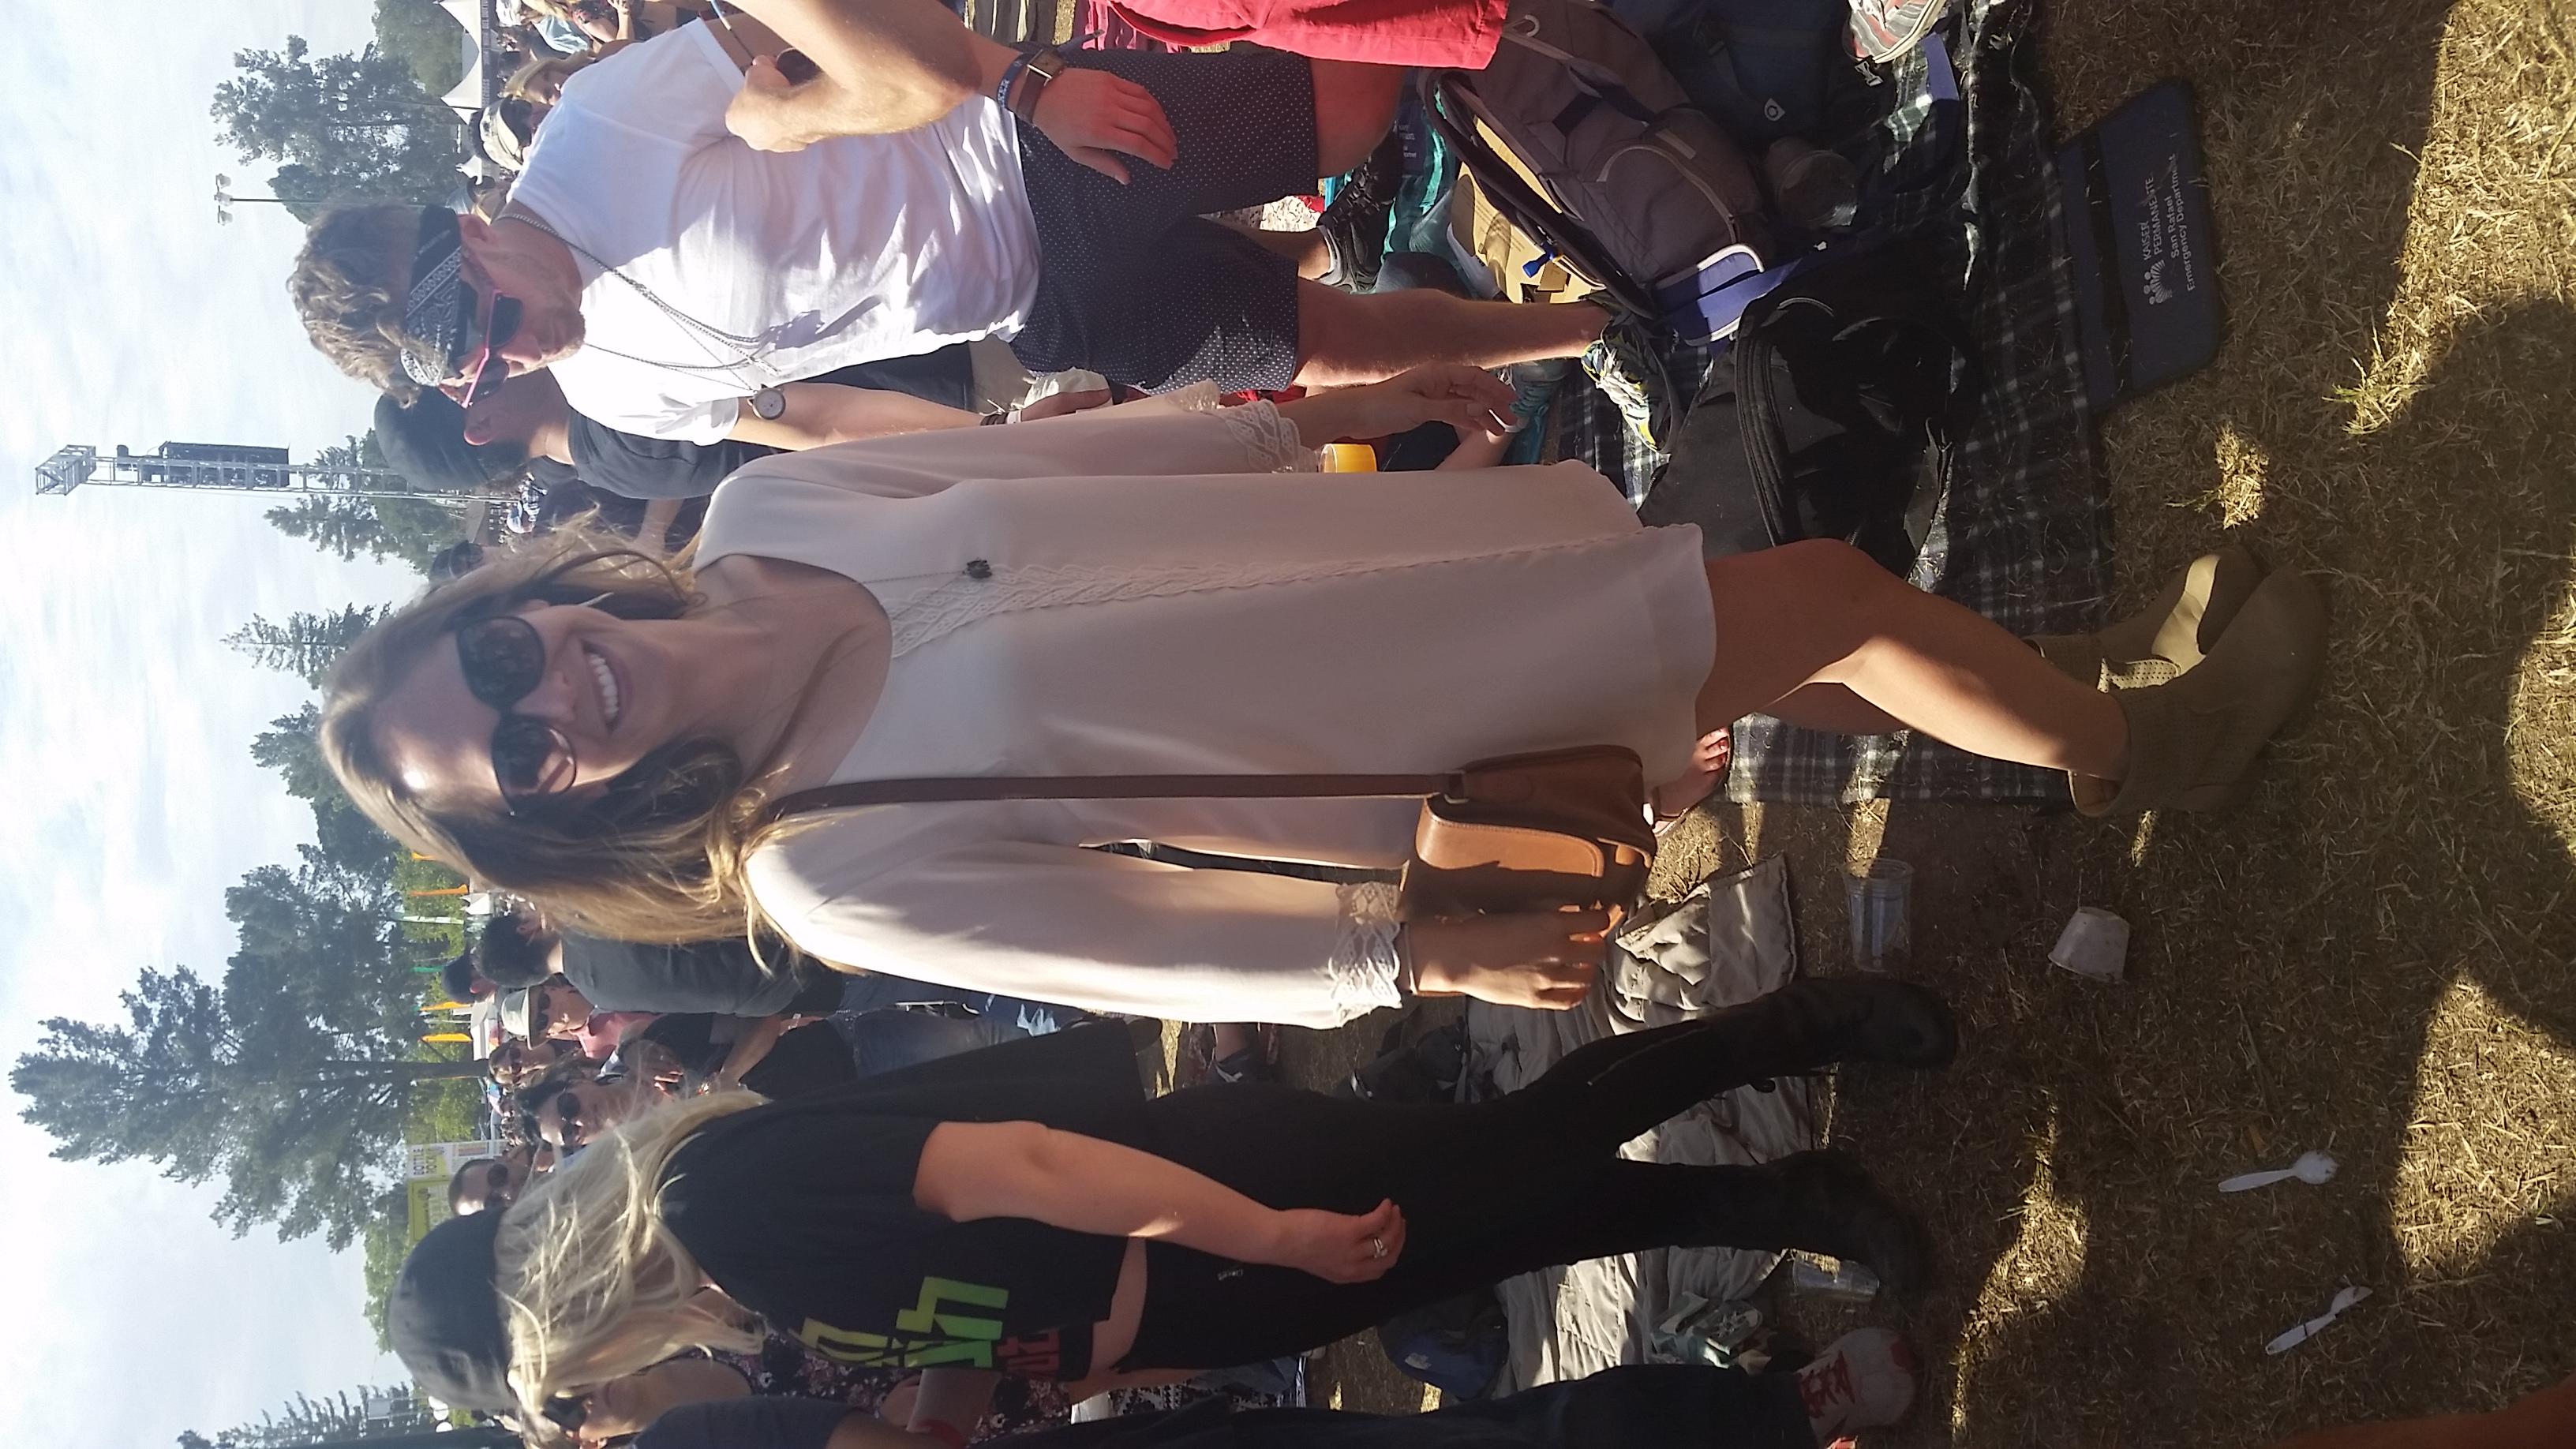 Style by Lt, Bottle Rock Napa fashion 2015